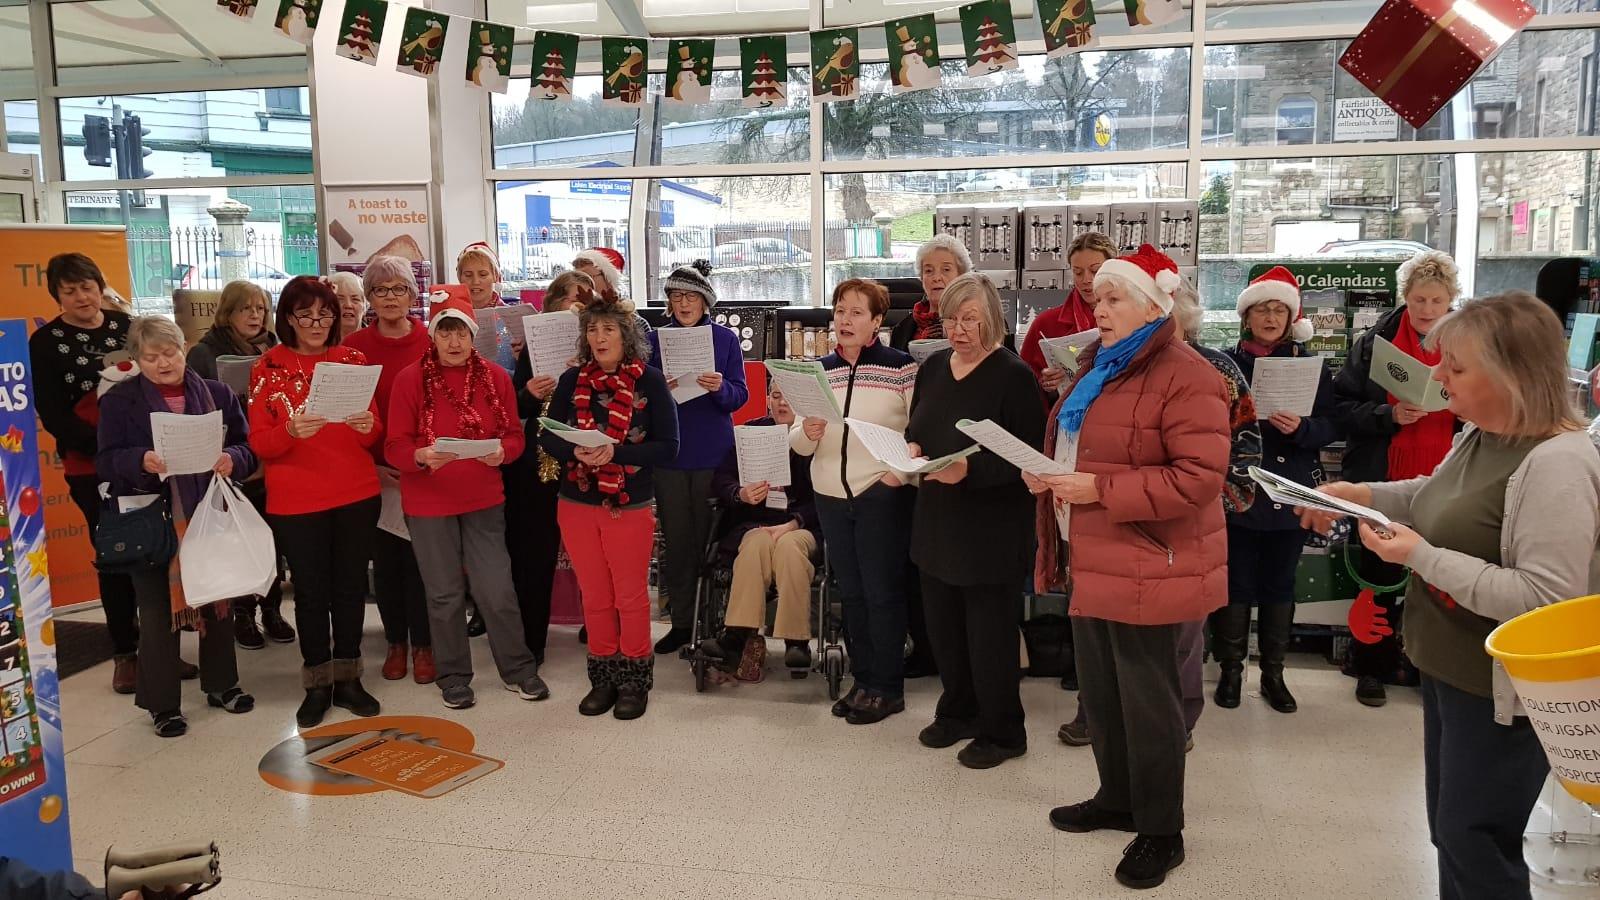 Carol Singing at Sainsbury's 2019